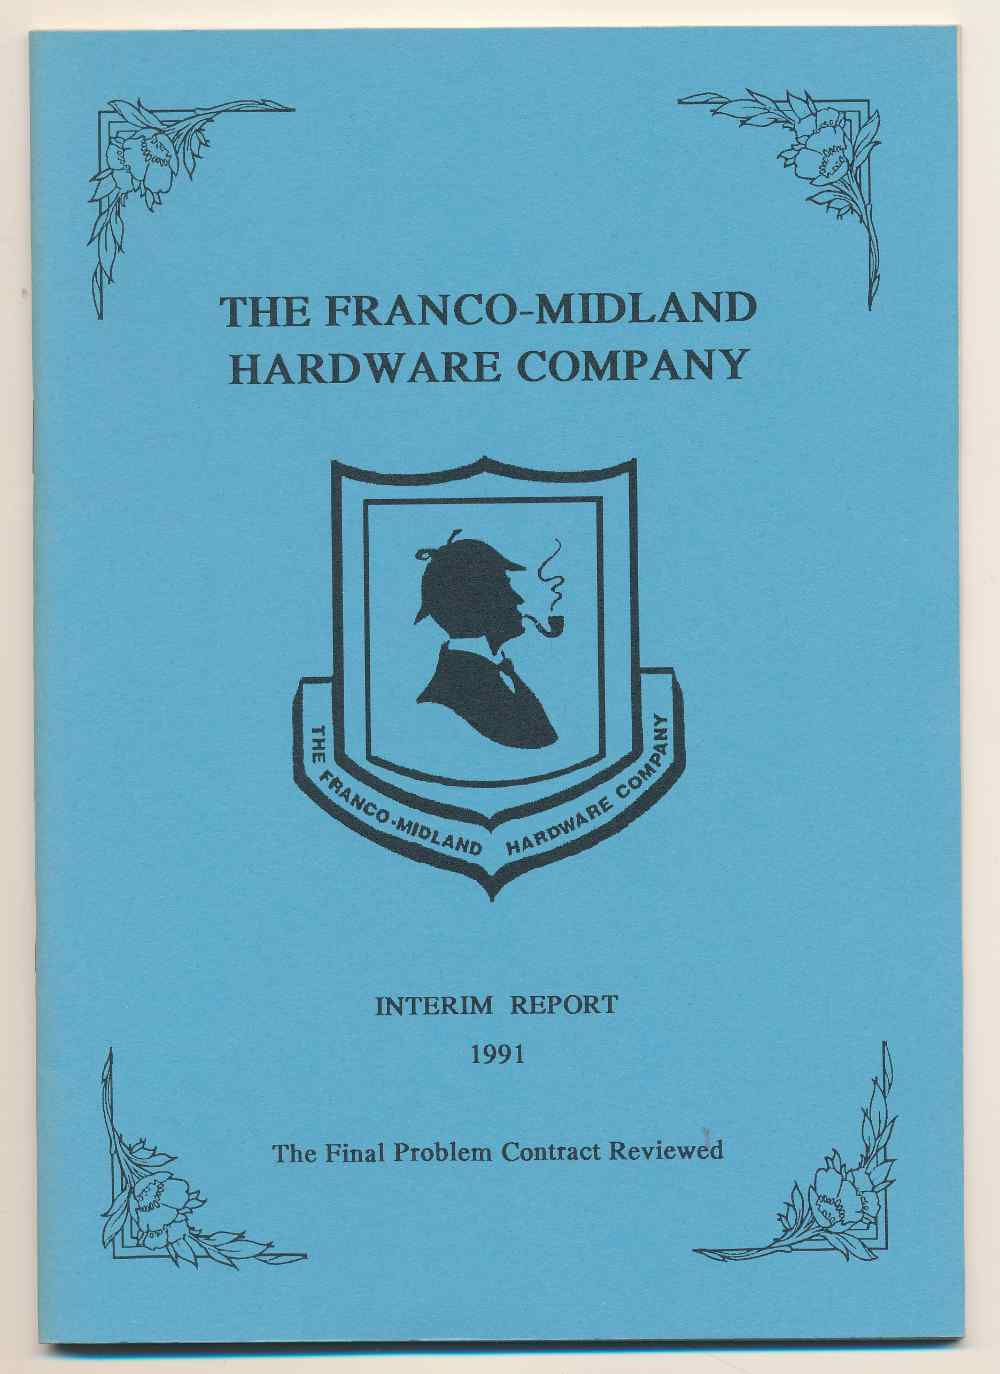 The Franco-Midland Hardware Company Interim Report